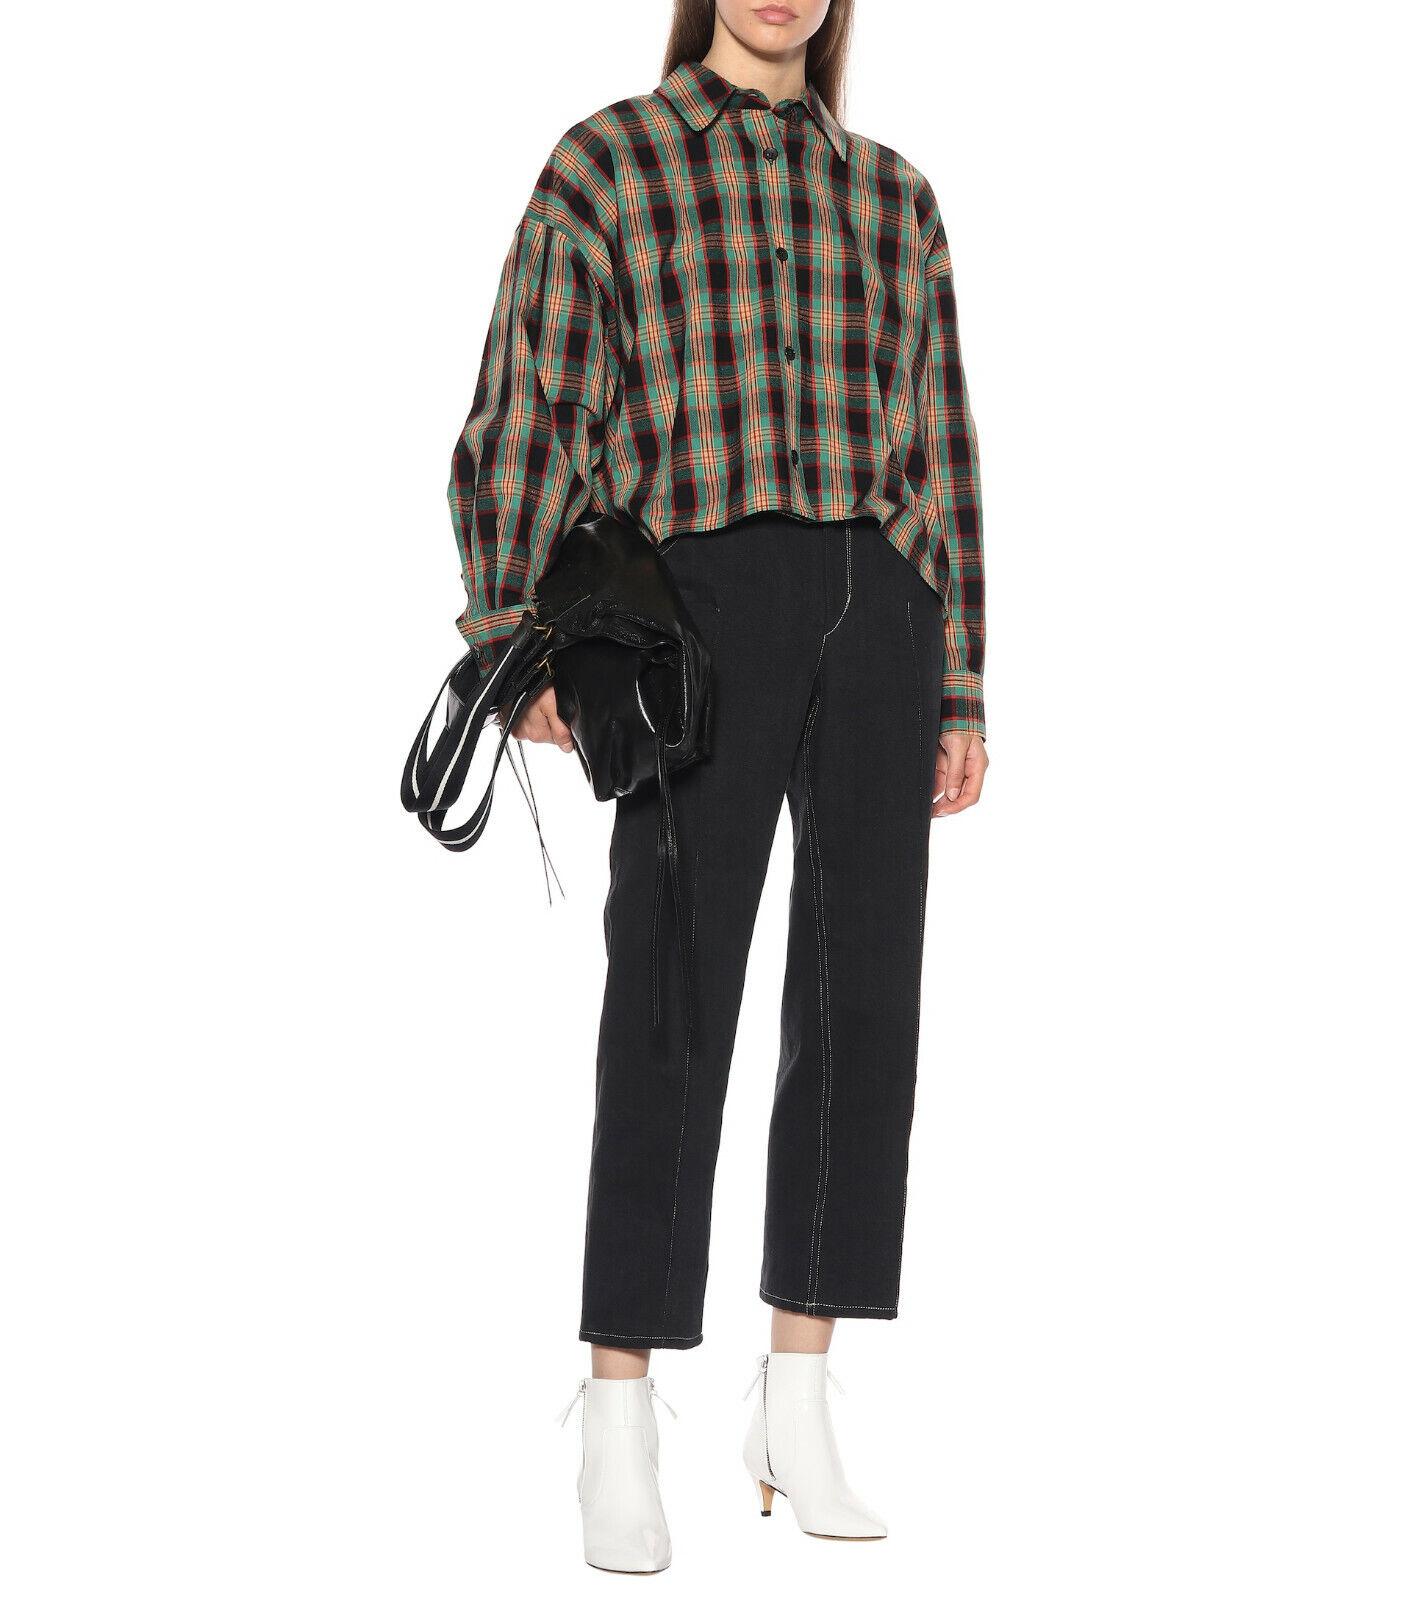 ISABEL MARANT Macao Plaid Cotton And Linen Shirt Größe 36 Orig.  NWT